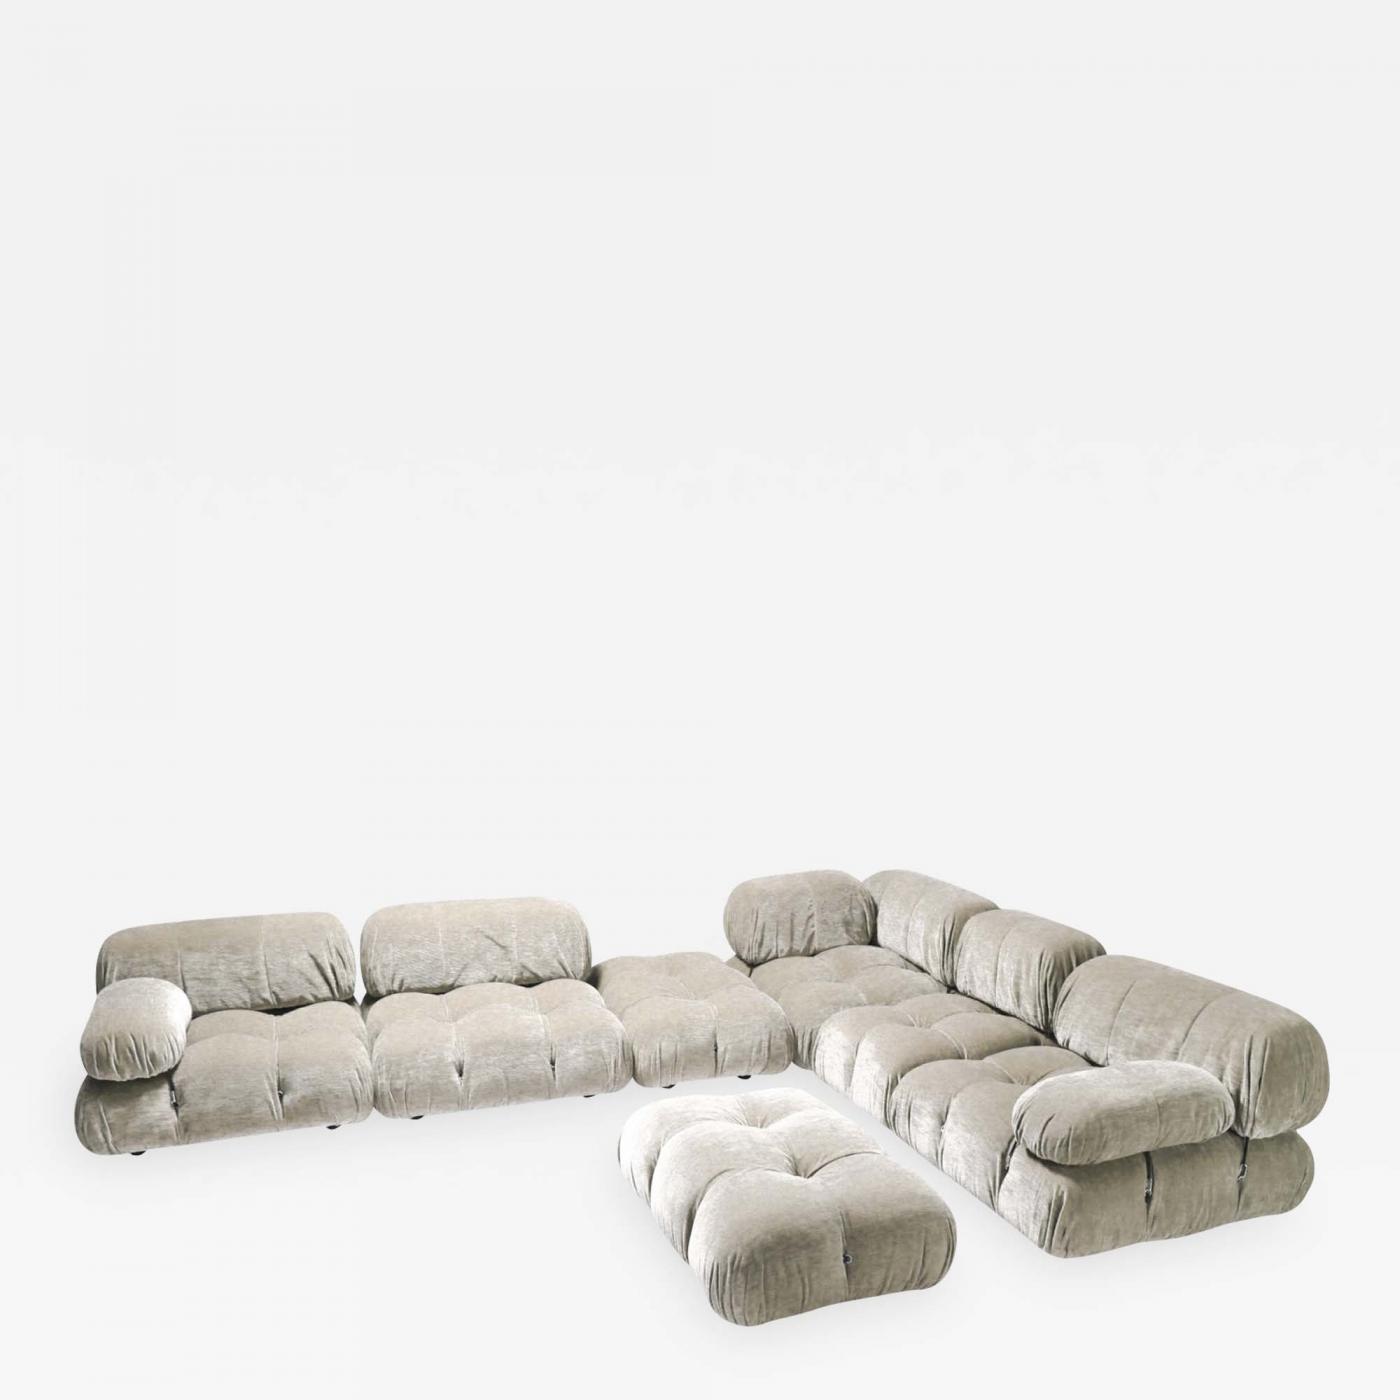 Strange Mario Bellini Velvet Sectional Sofa Model Camaleonda By Creativecarmelina Interior Chair Design Creativecarmelinacom